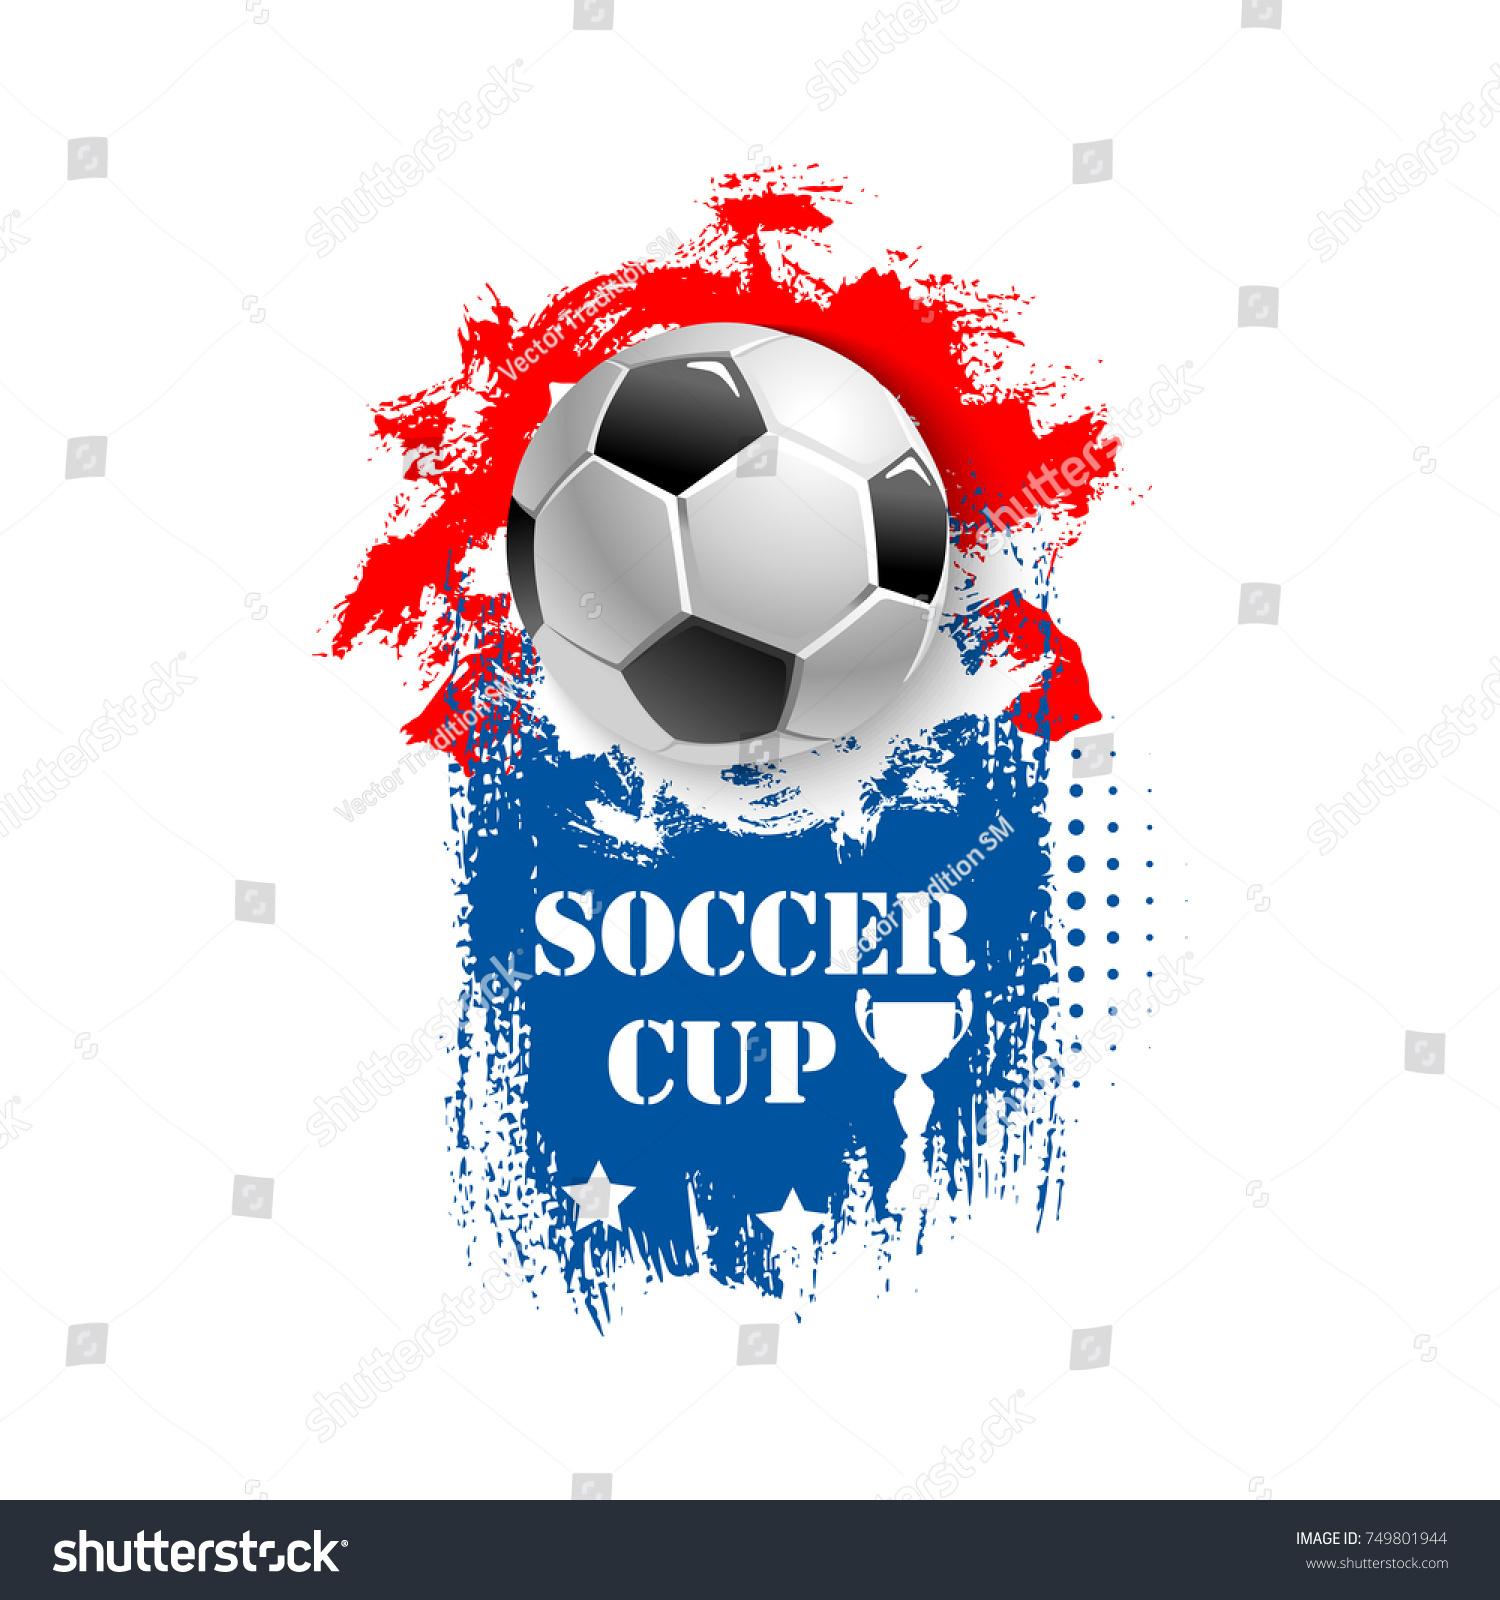 Soccer cup emblem template football sport stock vector 749801944 soccer cup emblem template for football sport tournament or championship vector design of football ball buycottarizona